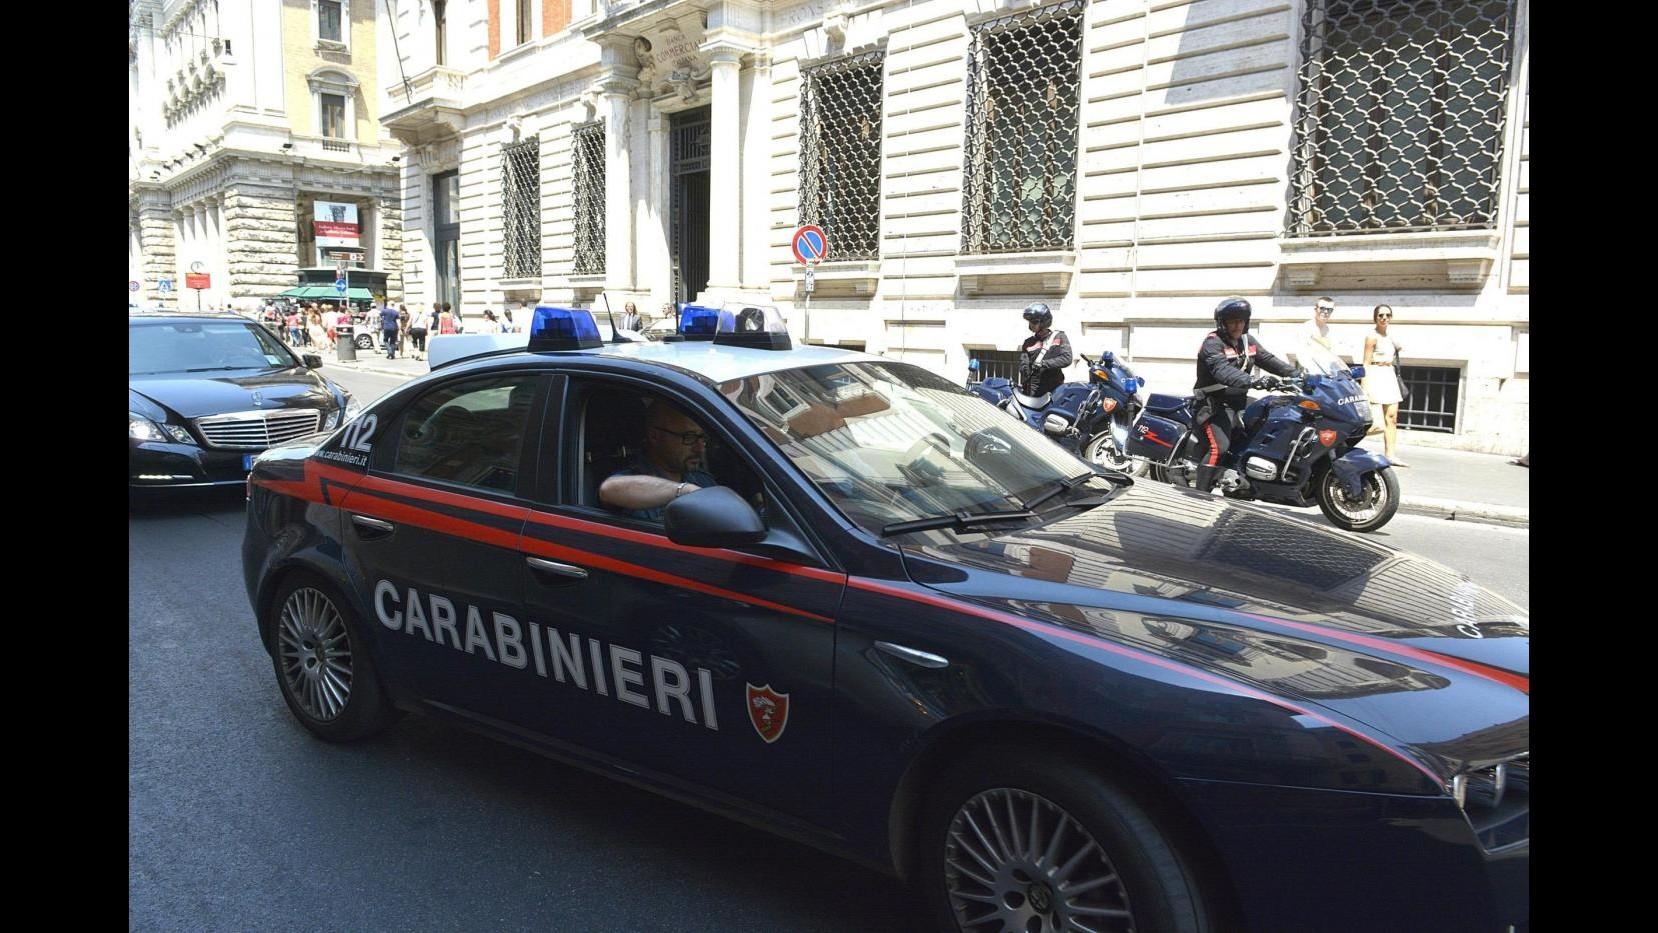 Salerno, false assunzioni: perquisizioni in sedi Inps